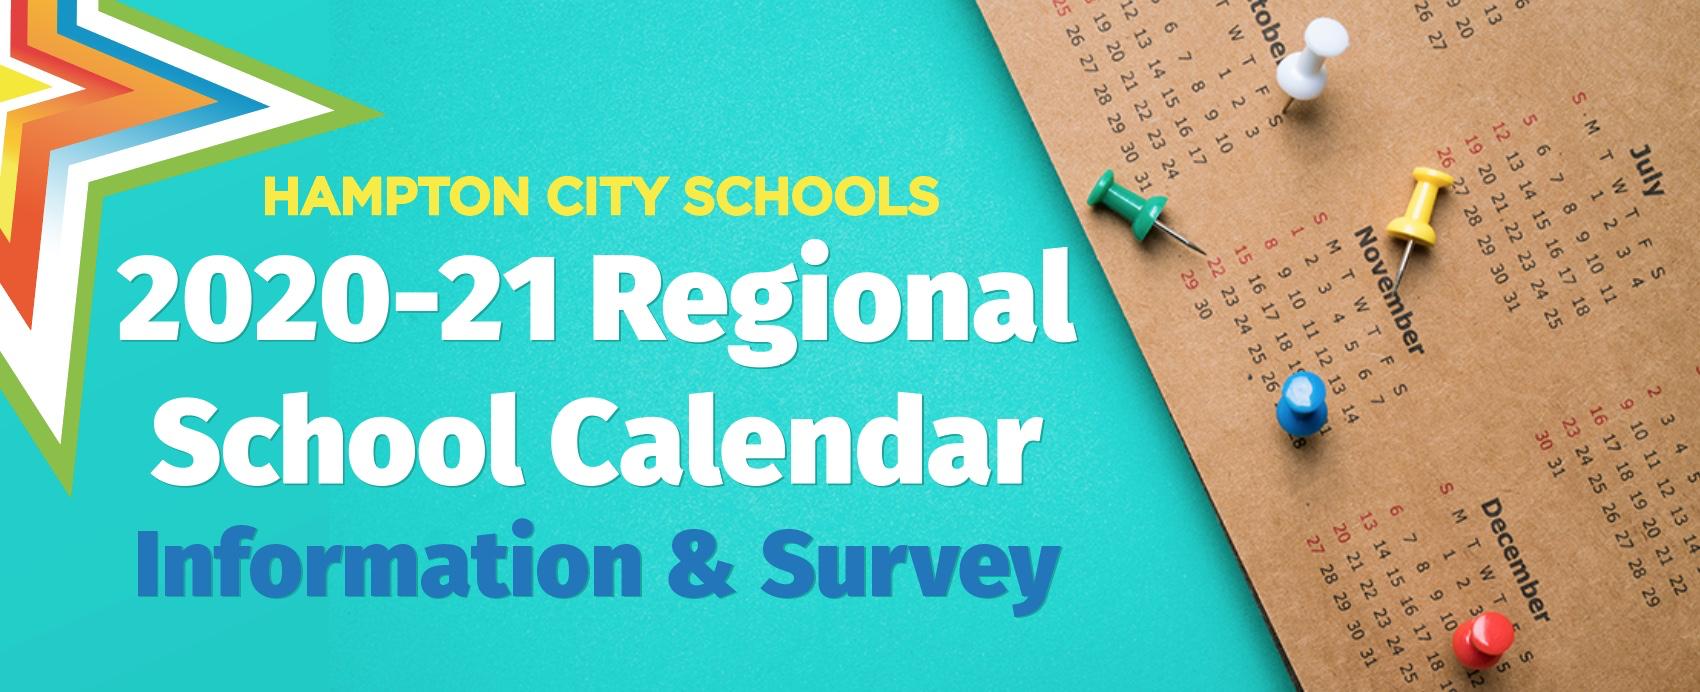 Hampton City Schools With Oyster Bay Calendar 2021